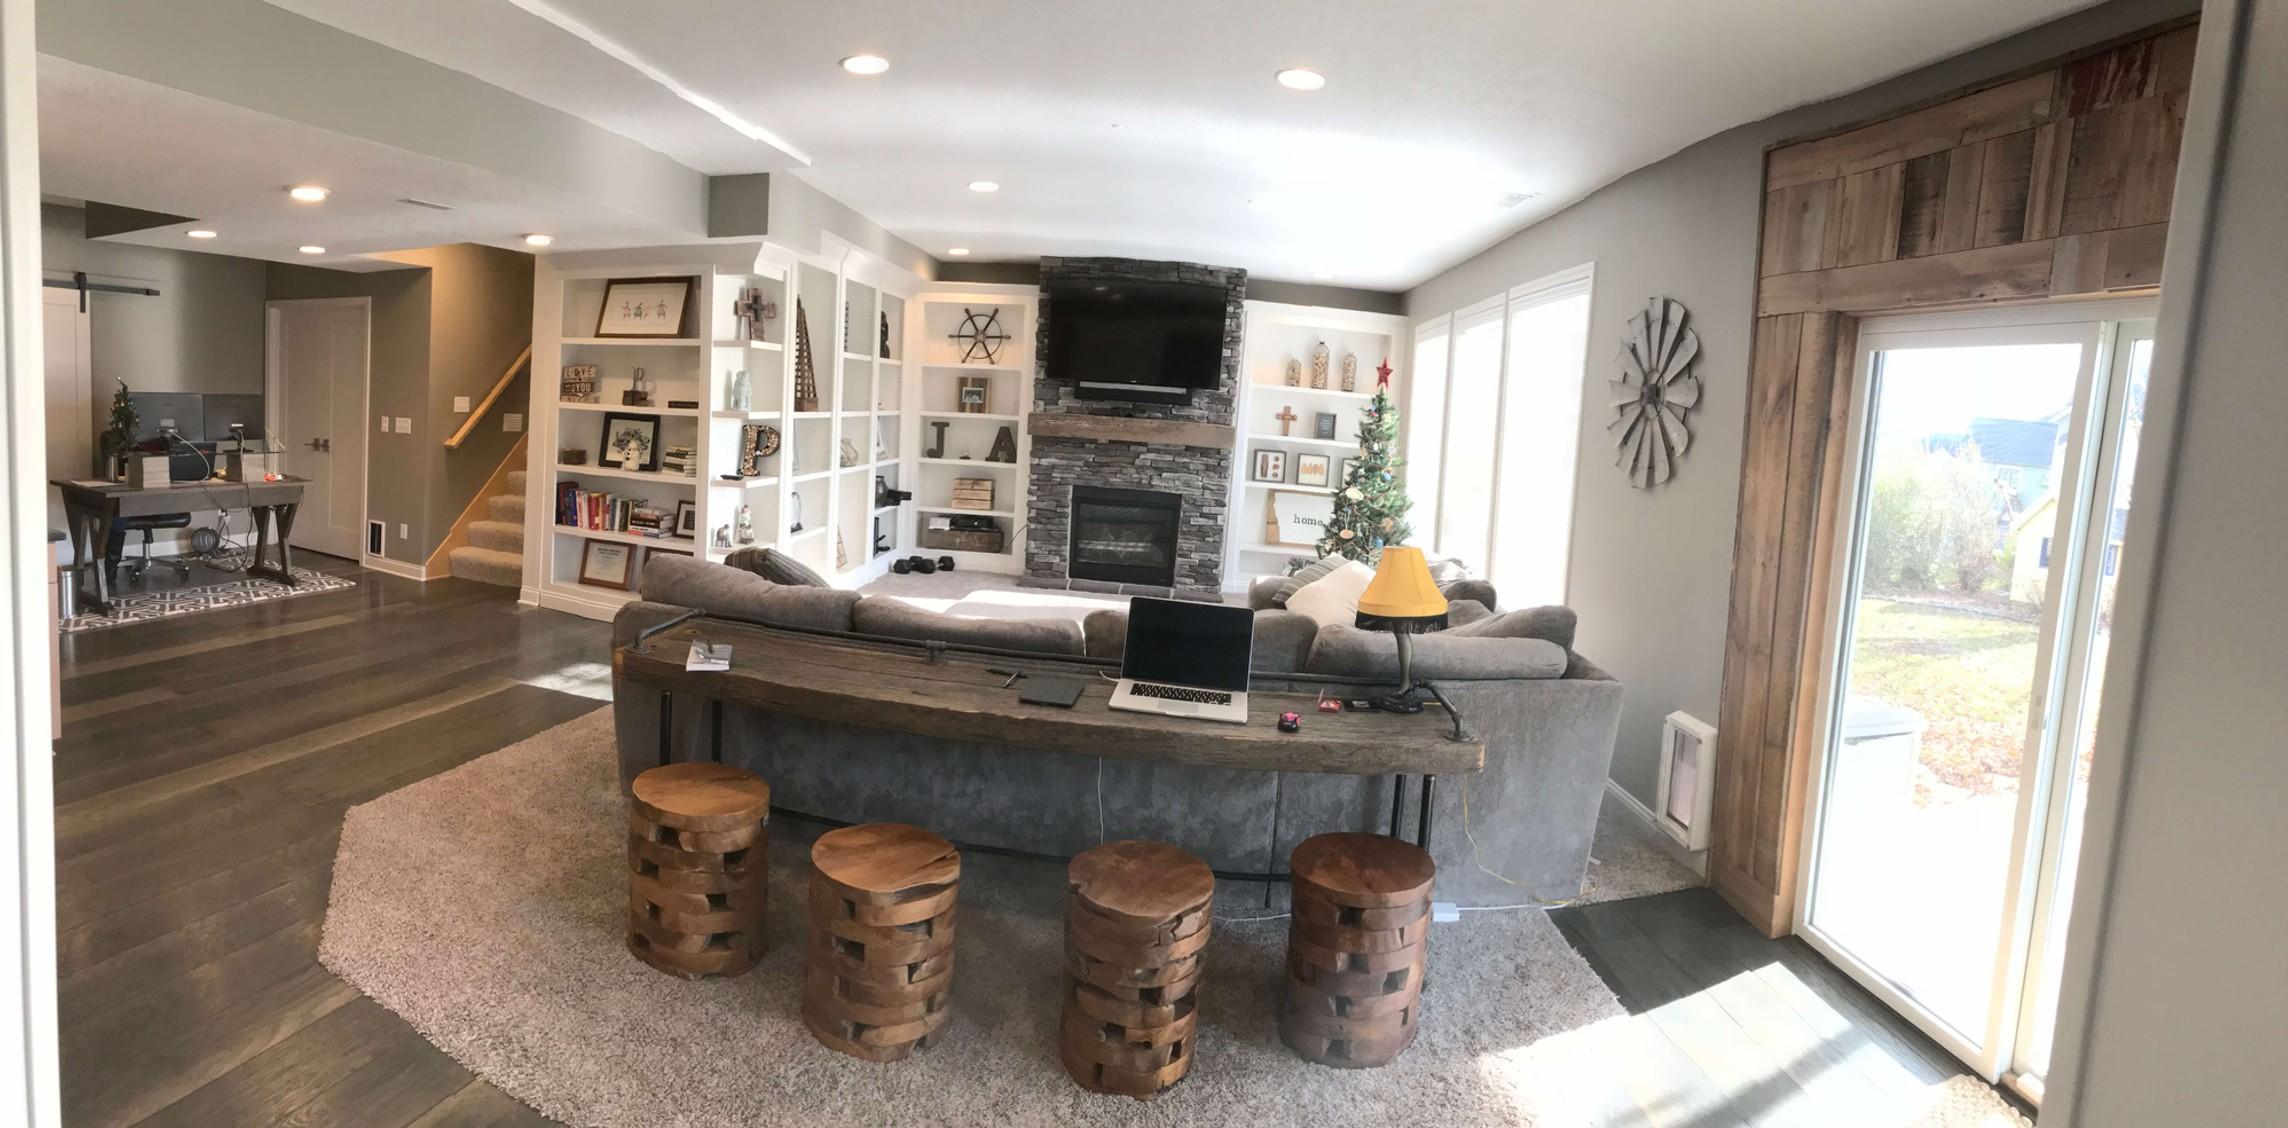 Great finished basement